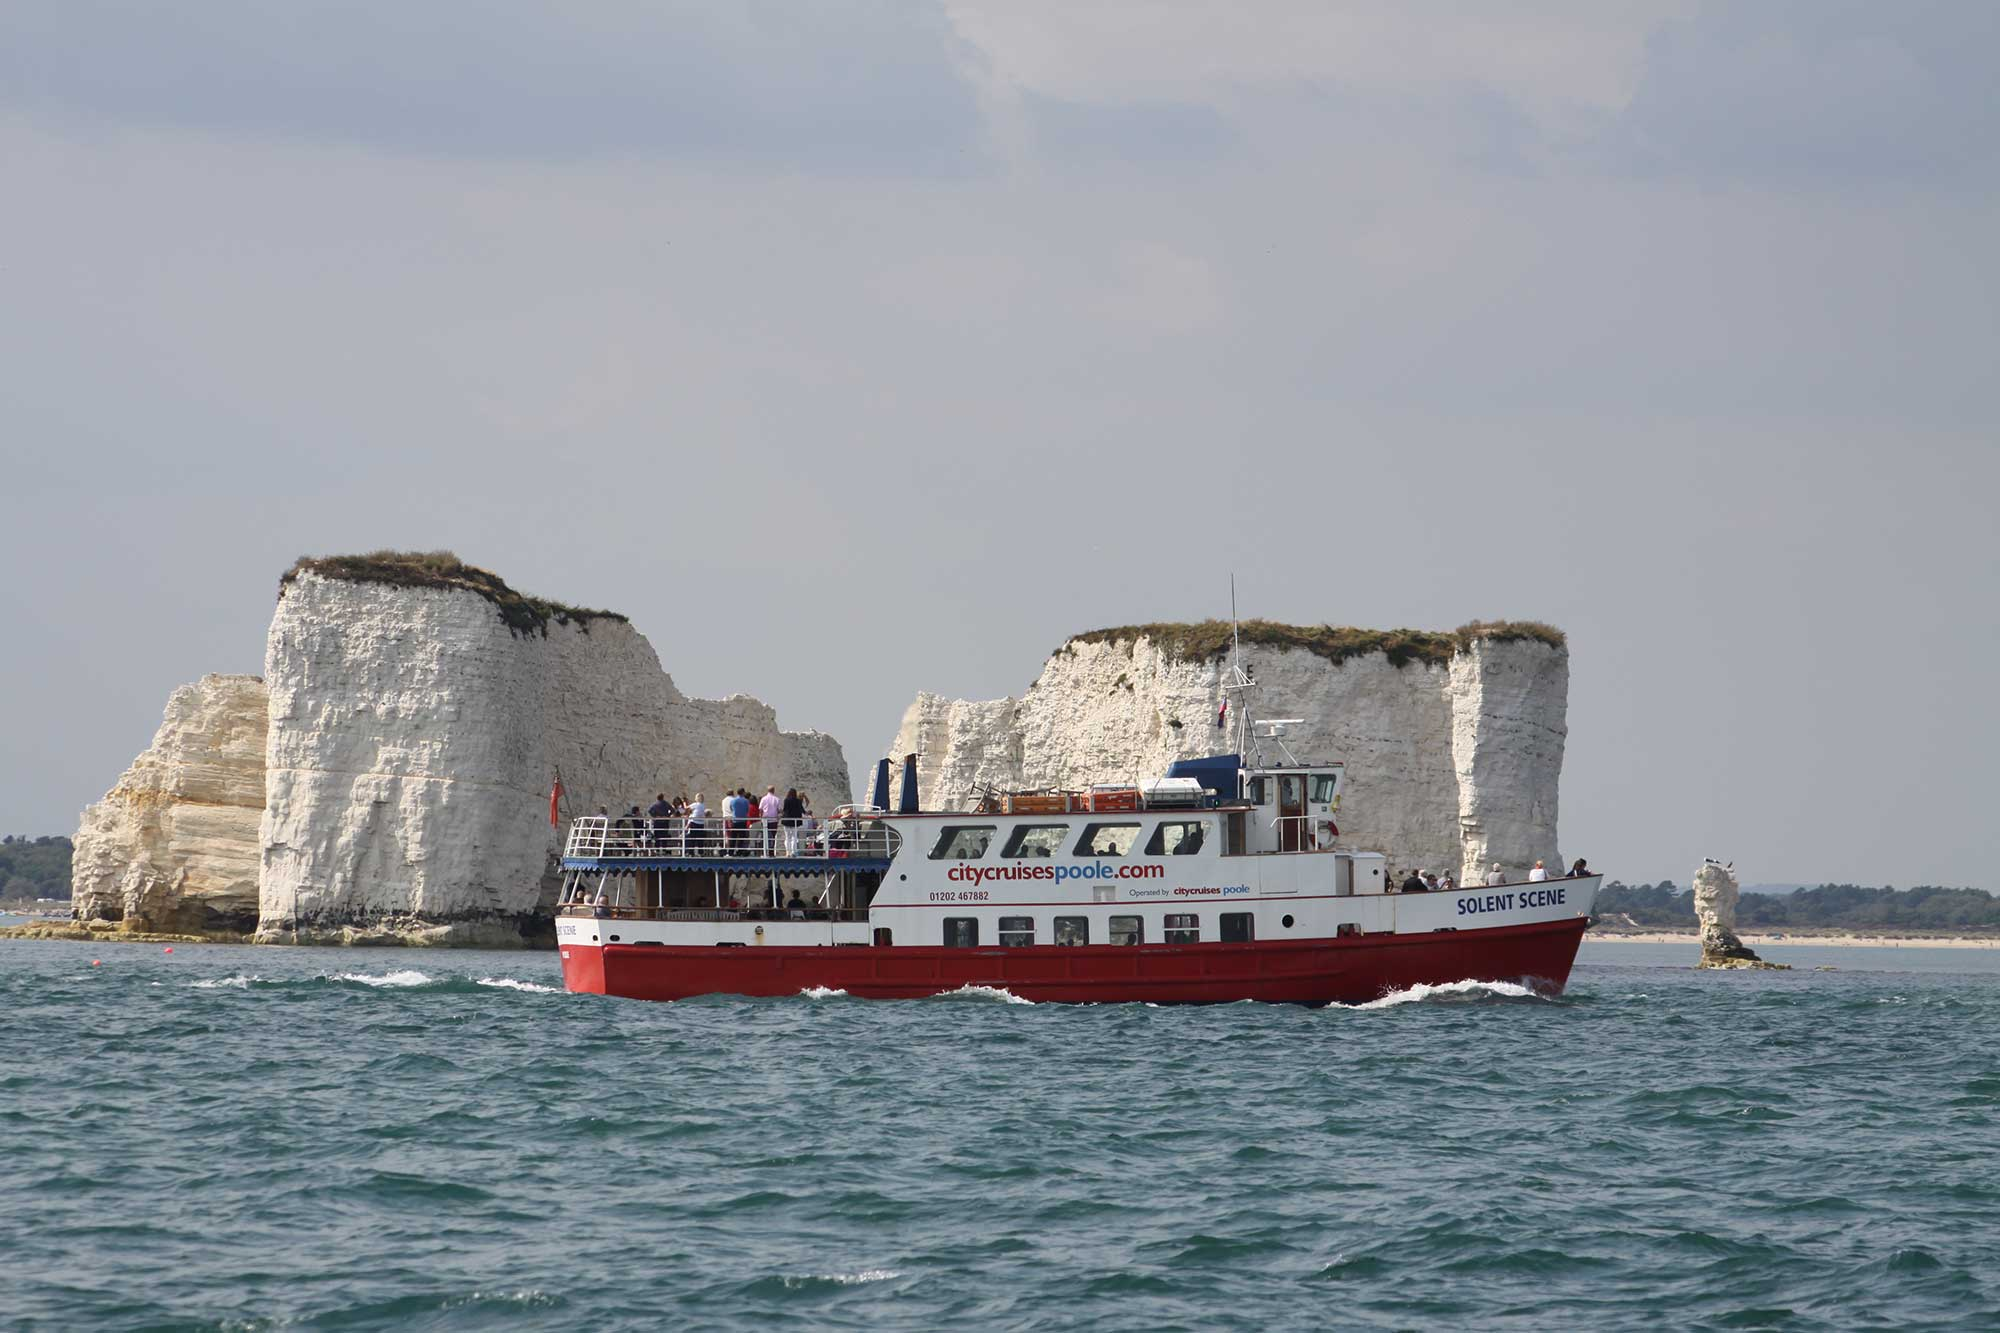 City Cruises Poole - Dorset tourist attraction